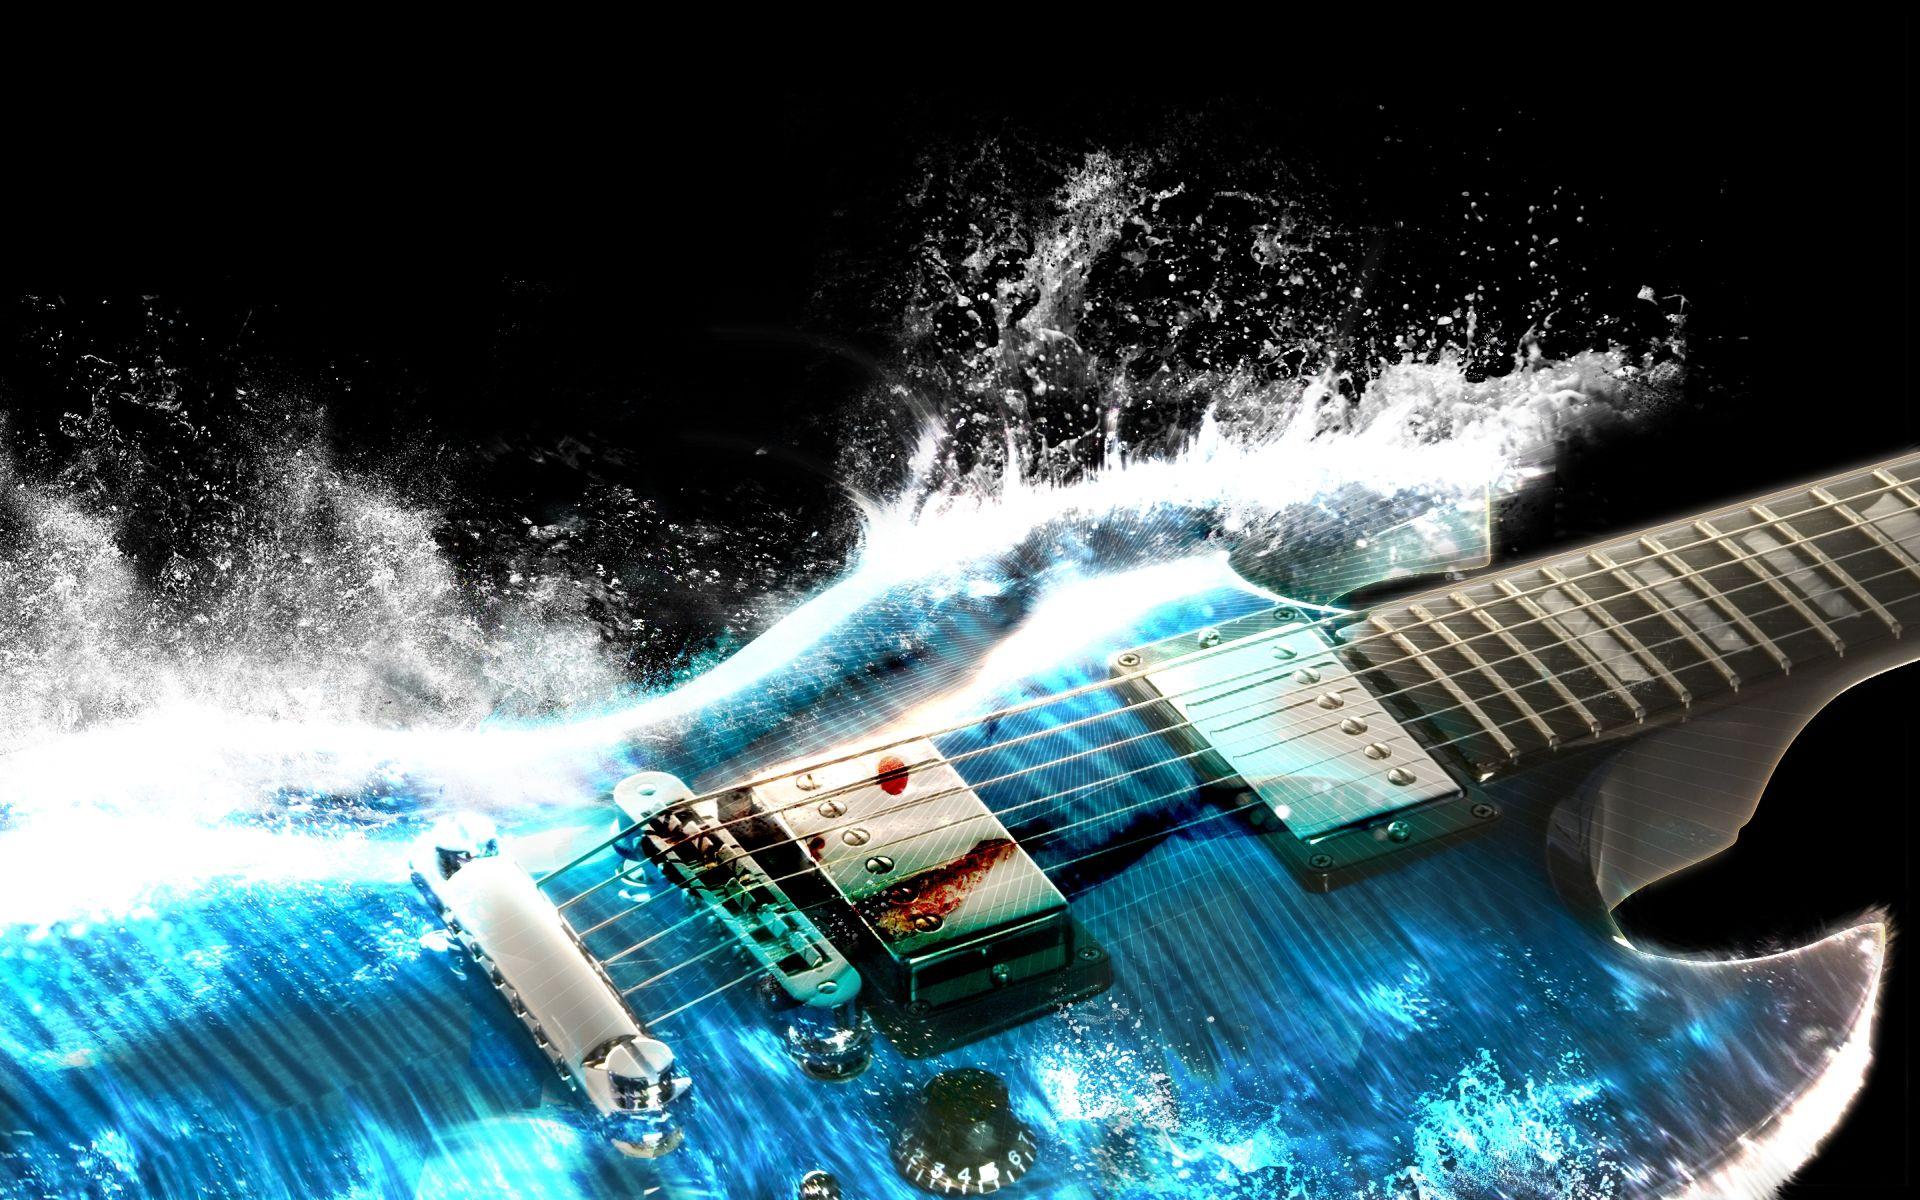 Electric Guitar blue, Good Wallpaper